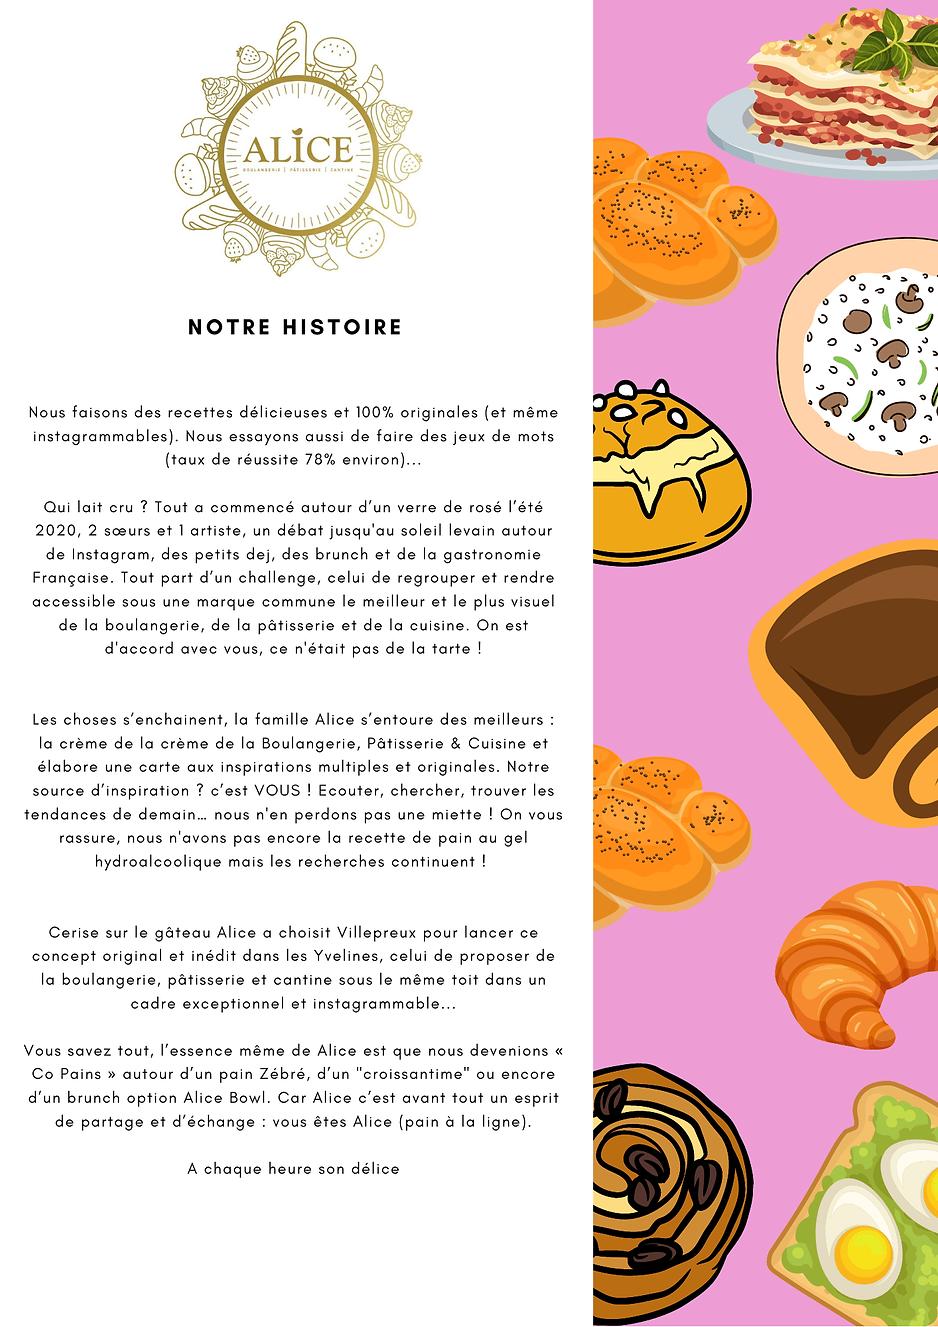 histoire alice oulangerie